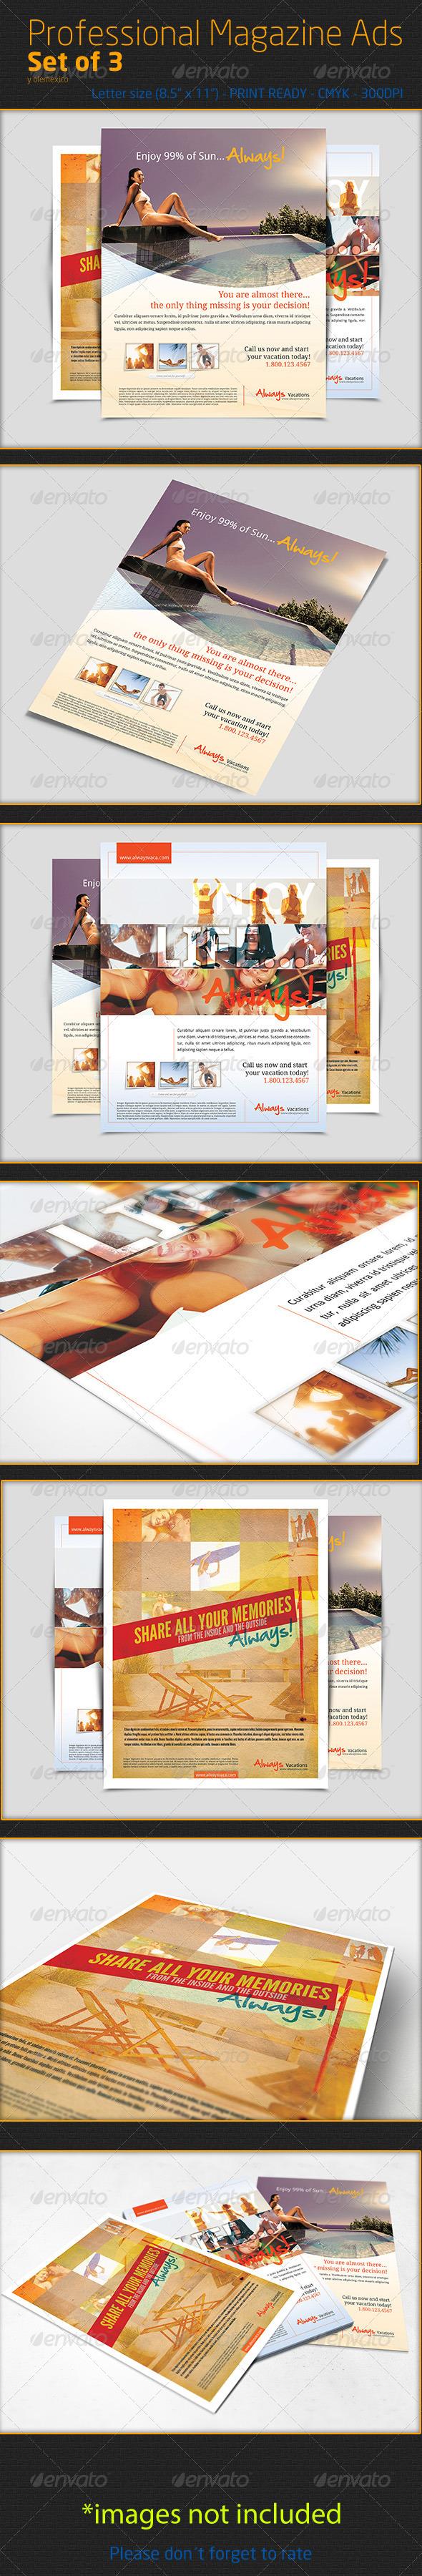 Professional Magazine Ads - Magazines Print Templates